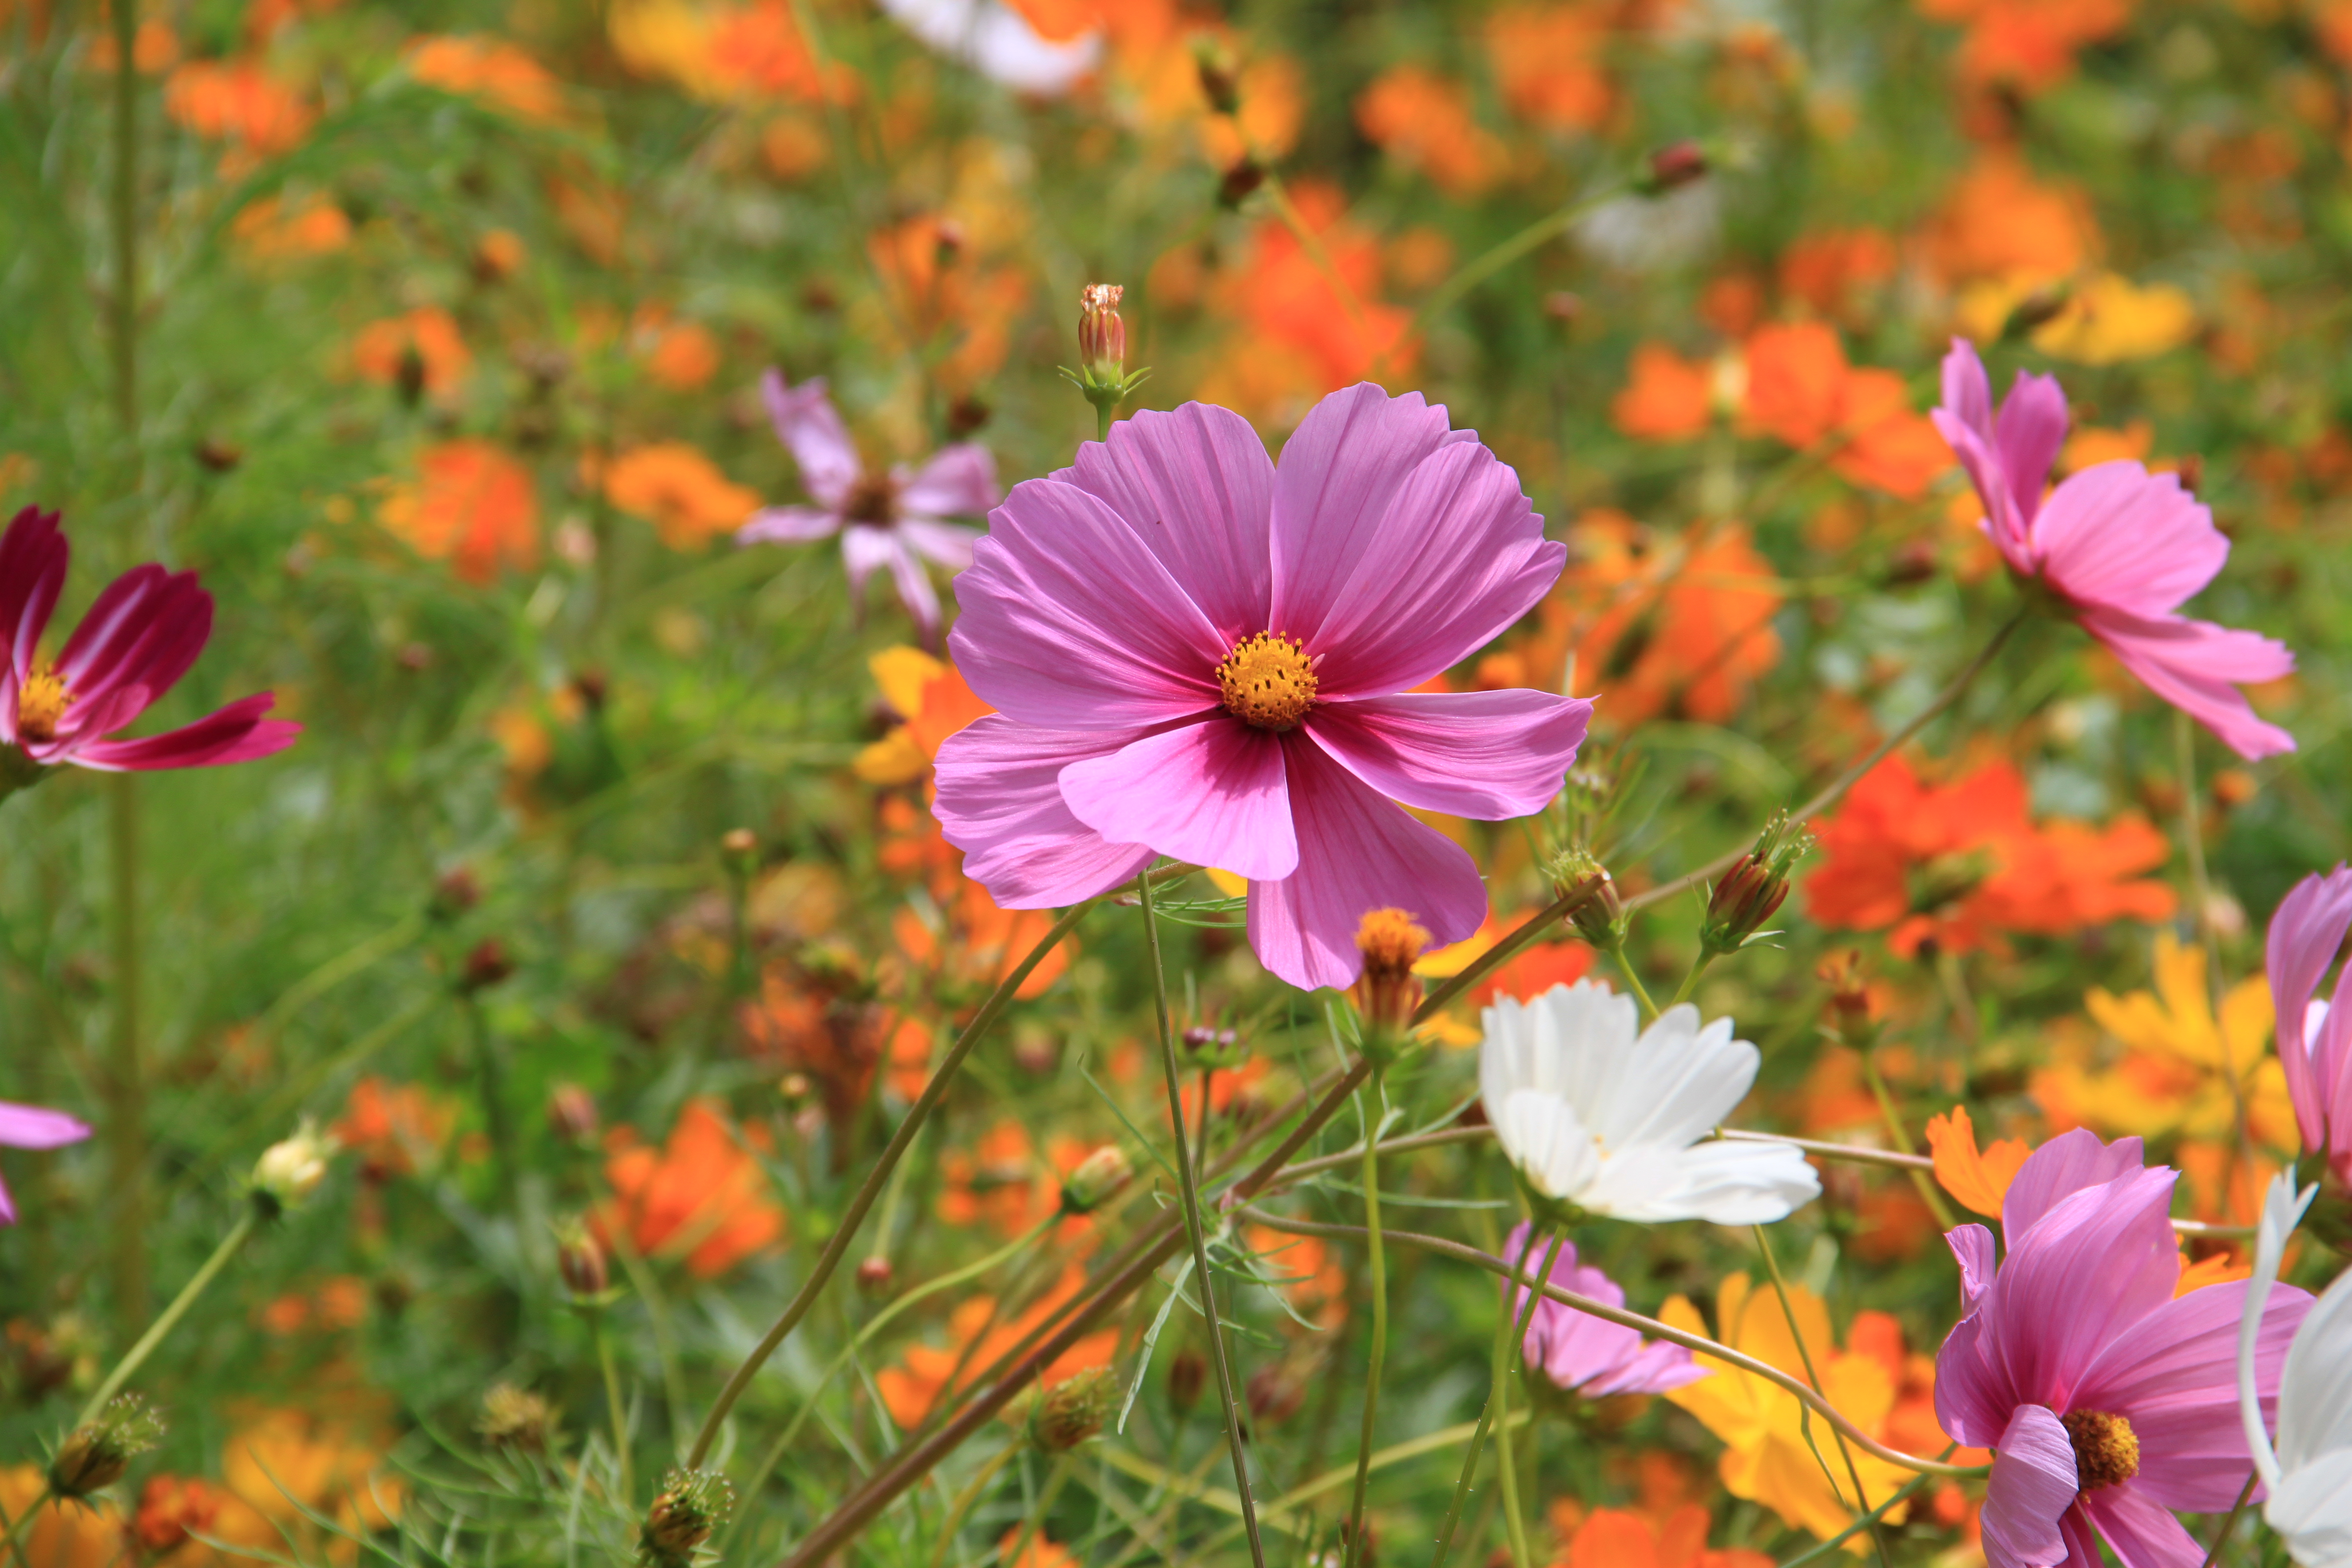 File:Fleur violette prairie Compans.jpg - Wikimedia Commons